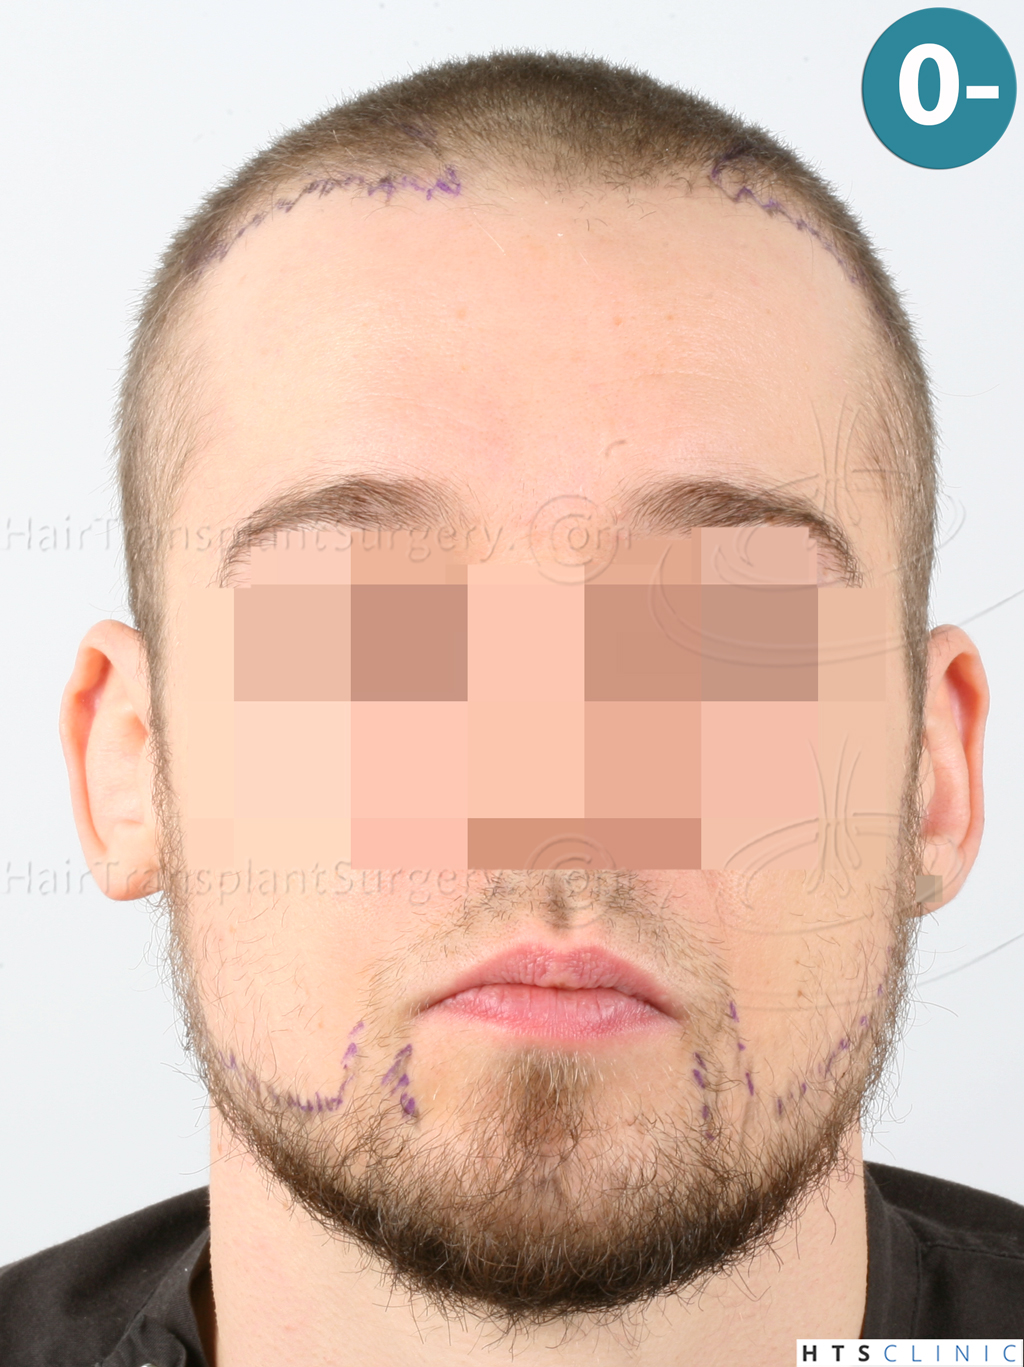 Dr.Devroye-HTS-Clinic-6132-_2011_1232_2889_-FUE-Barbe-et-cheveux-9.jpg